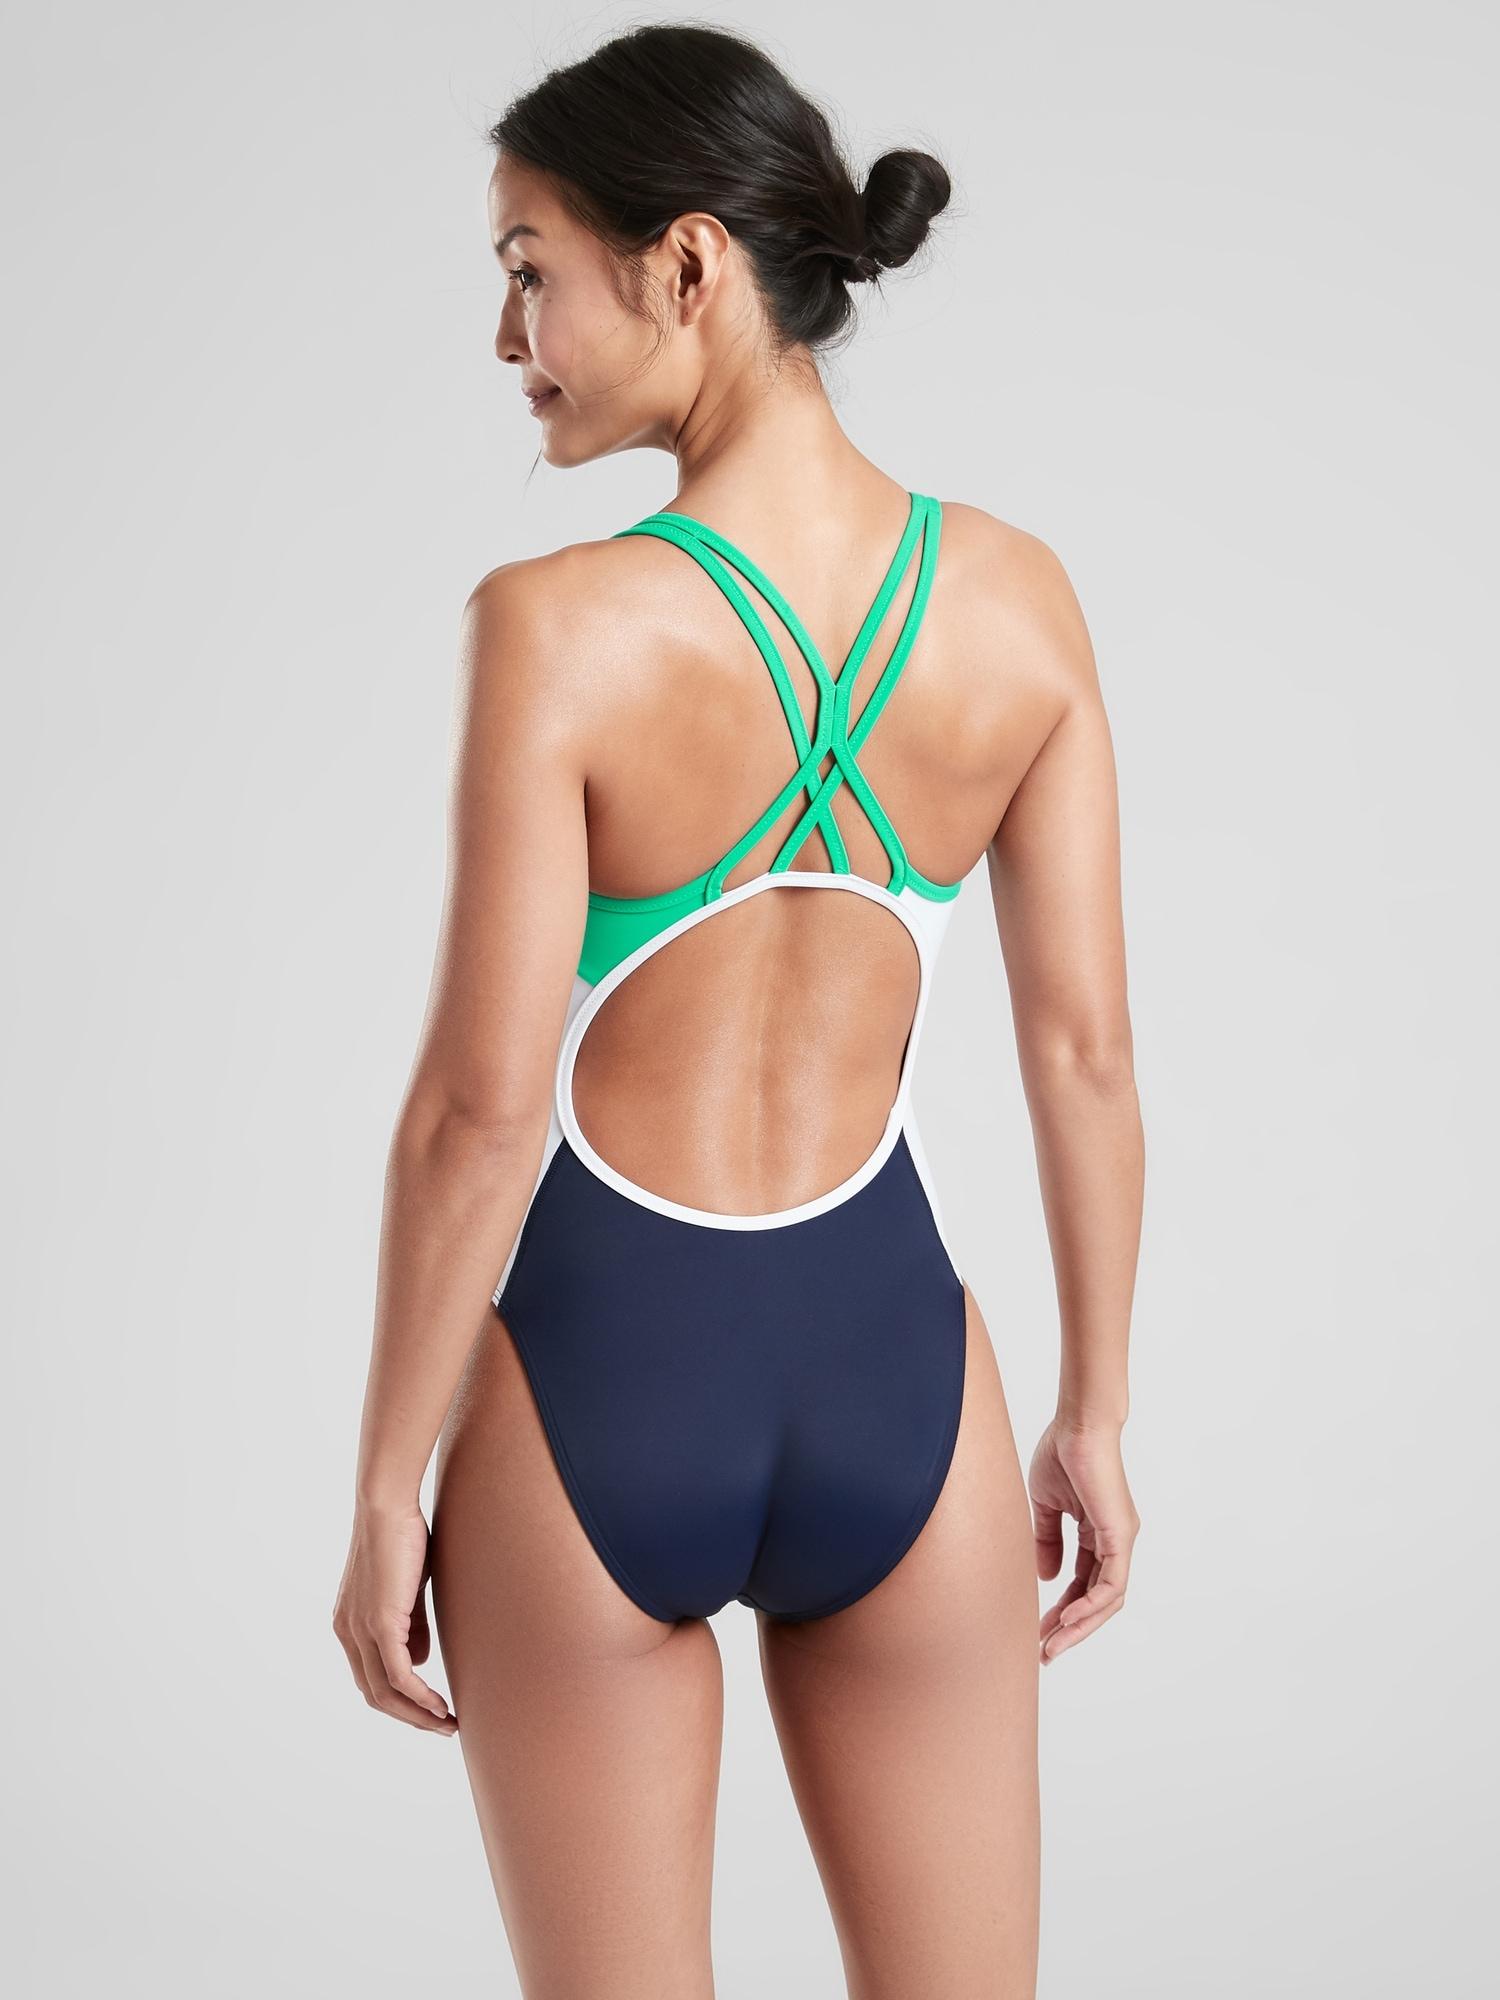 Navy SIZE M        #778114 N0413 NWT Athleta Colorblock Tri-ssential Swim Capri